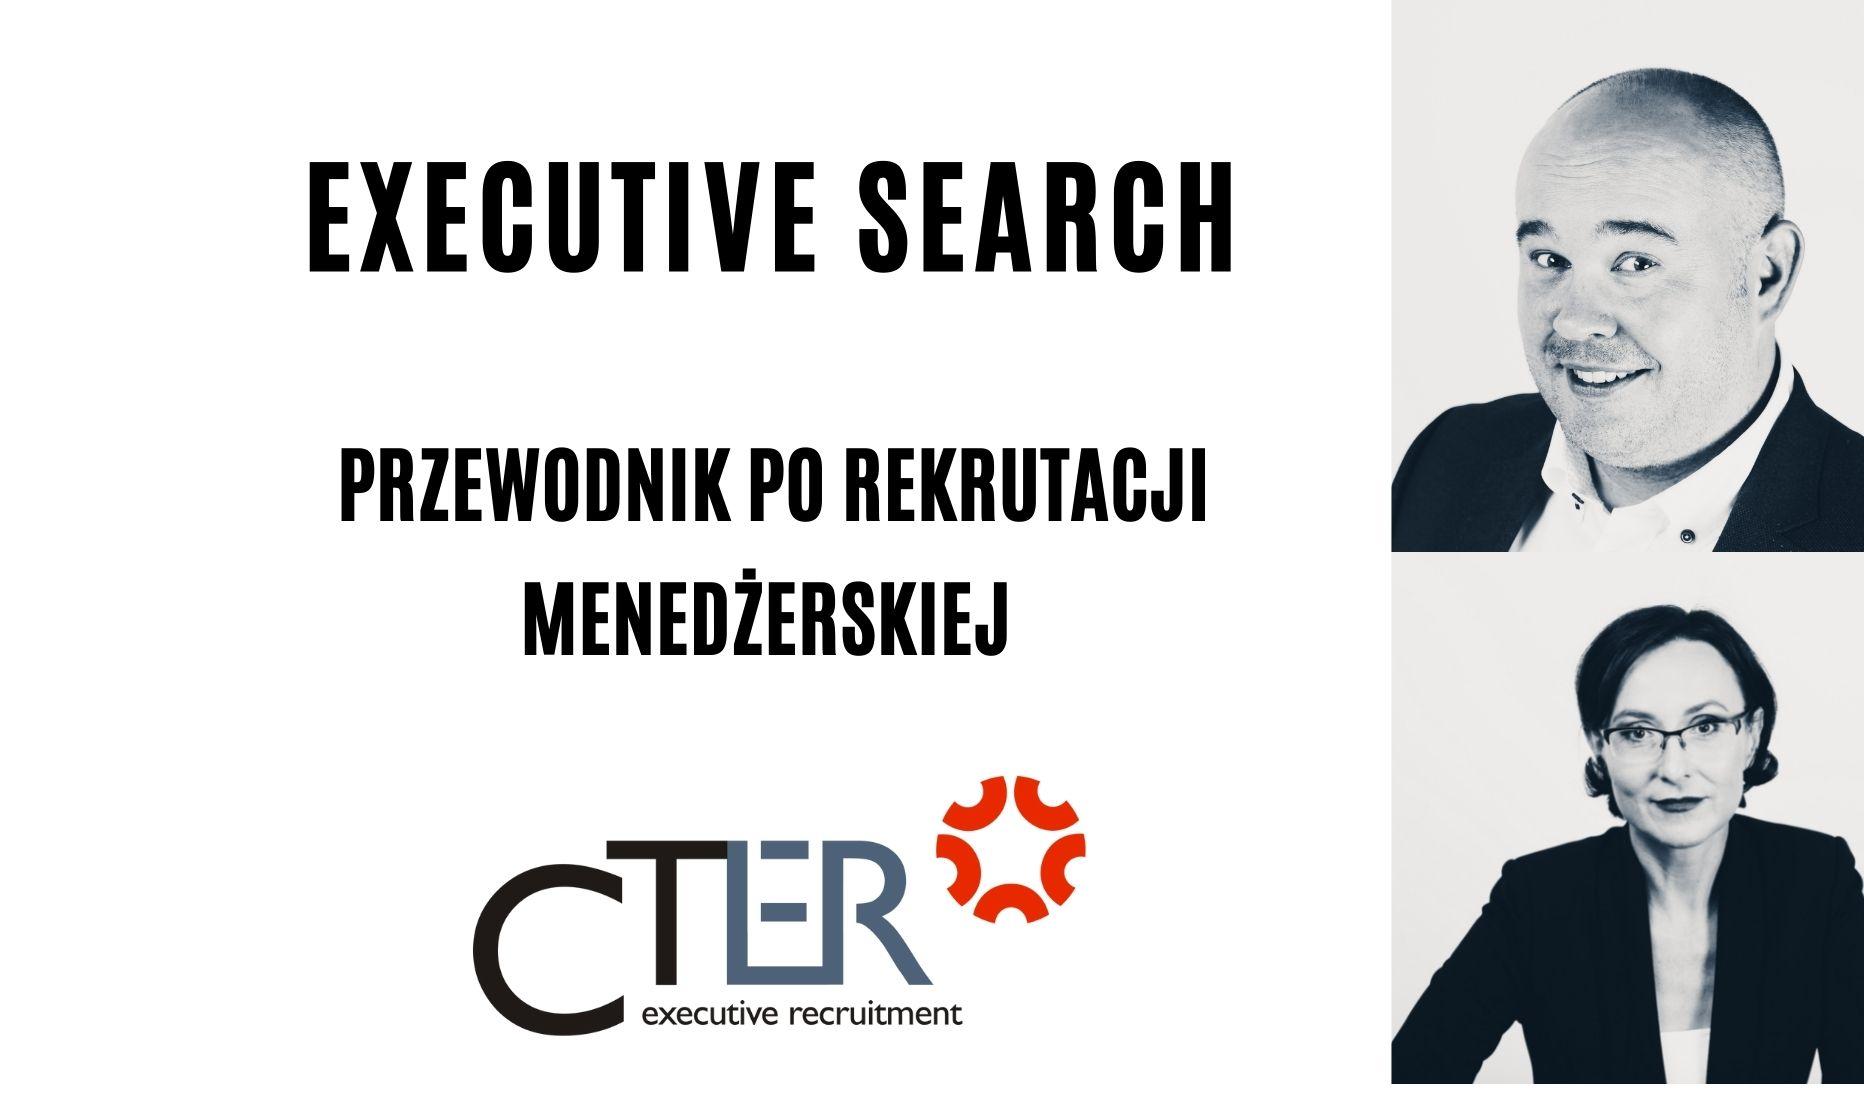 excutive search